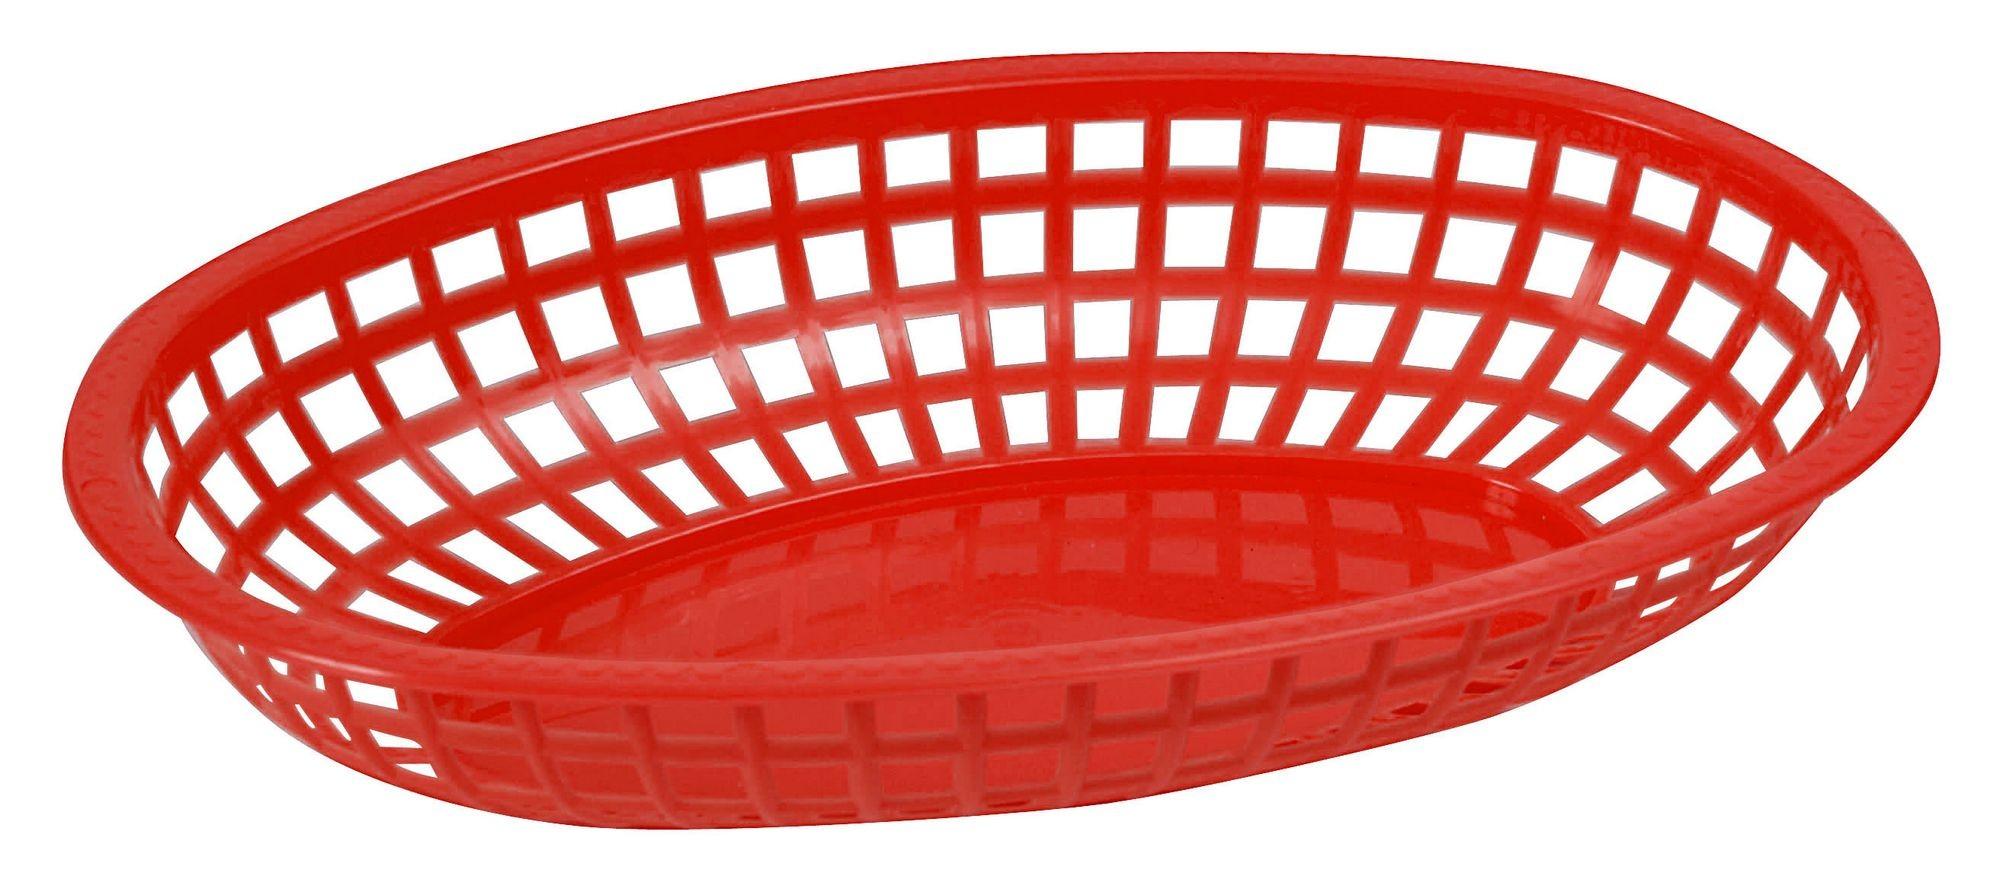 "Winco POB-R Red Premium Oval Basket 10-1/4"" x 6-3/4"" x 2"""